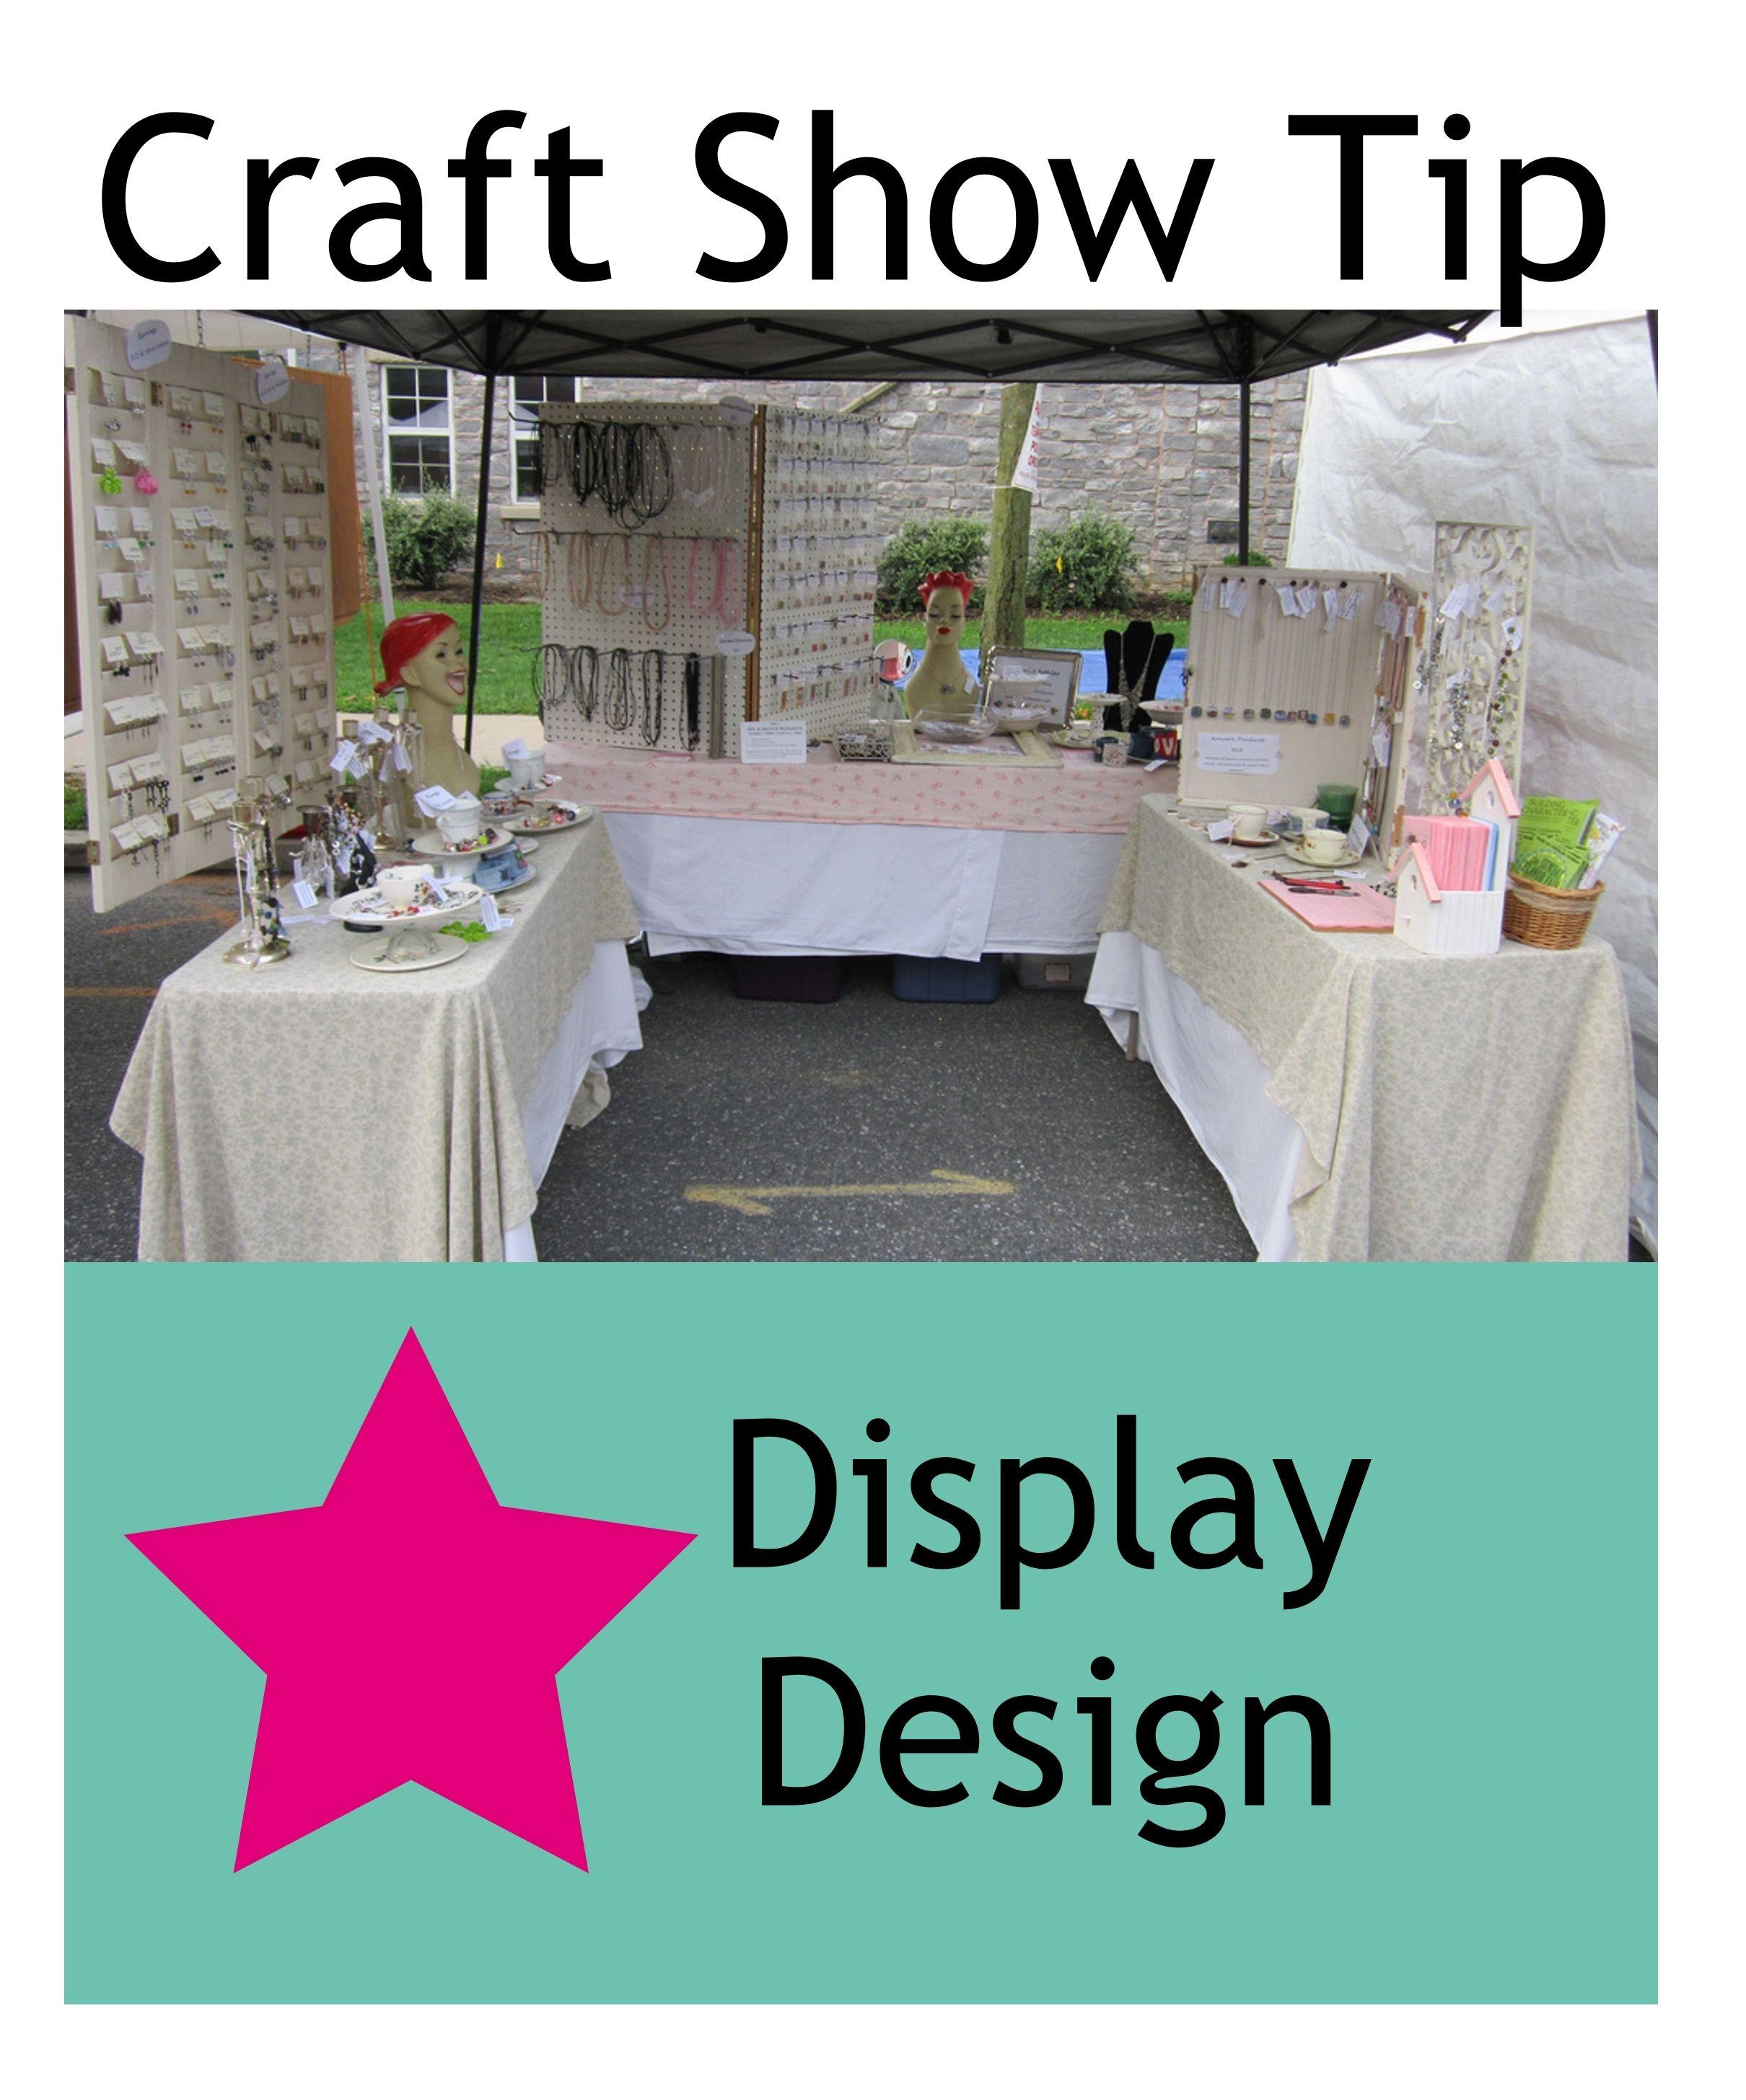 Craft Show Tip